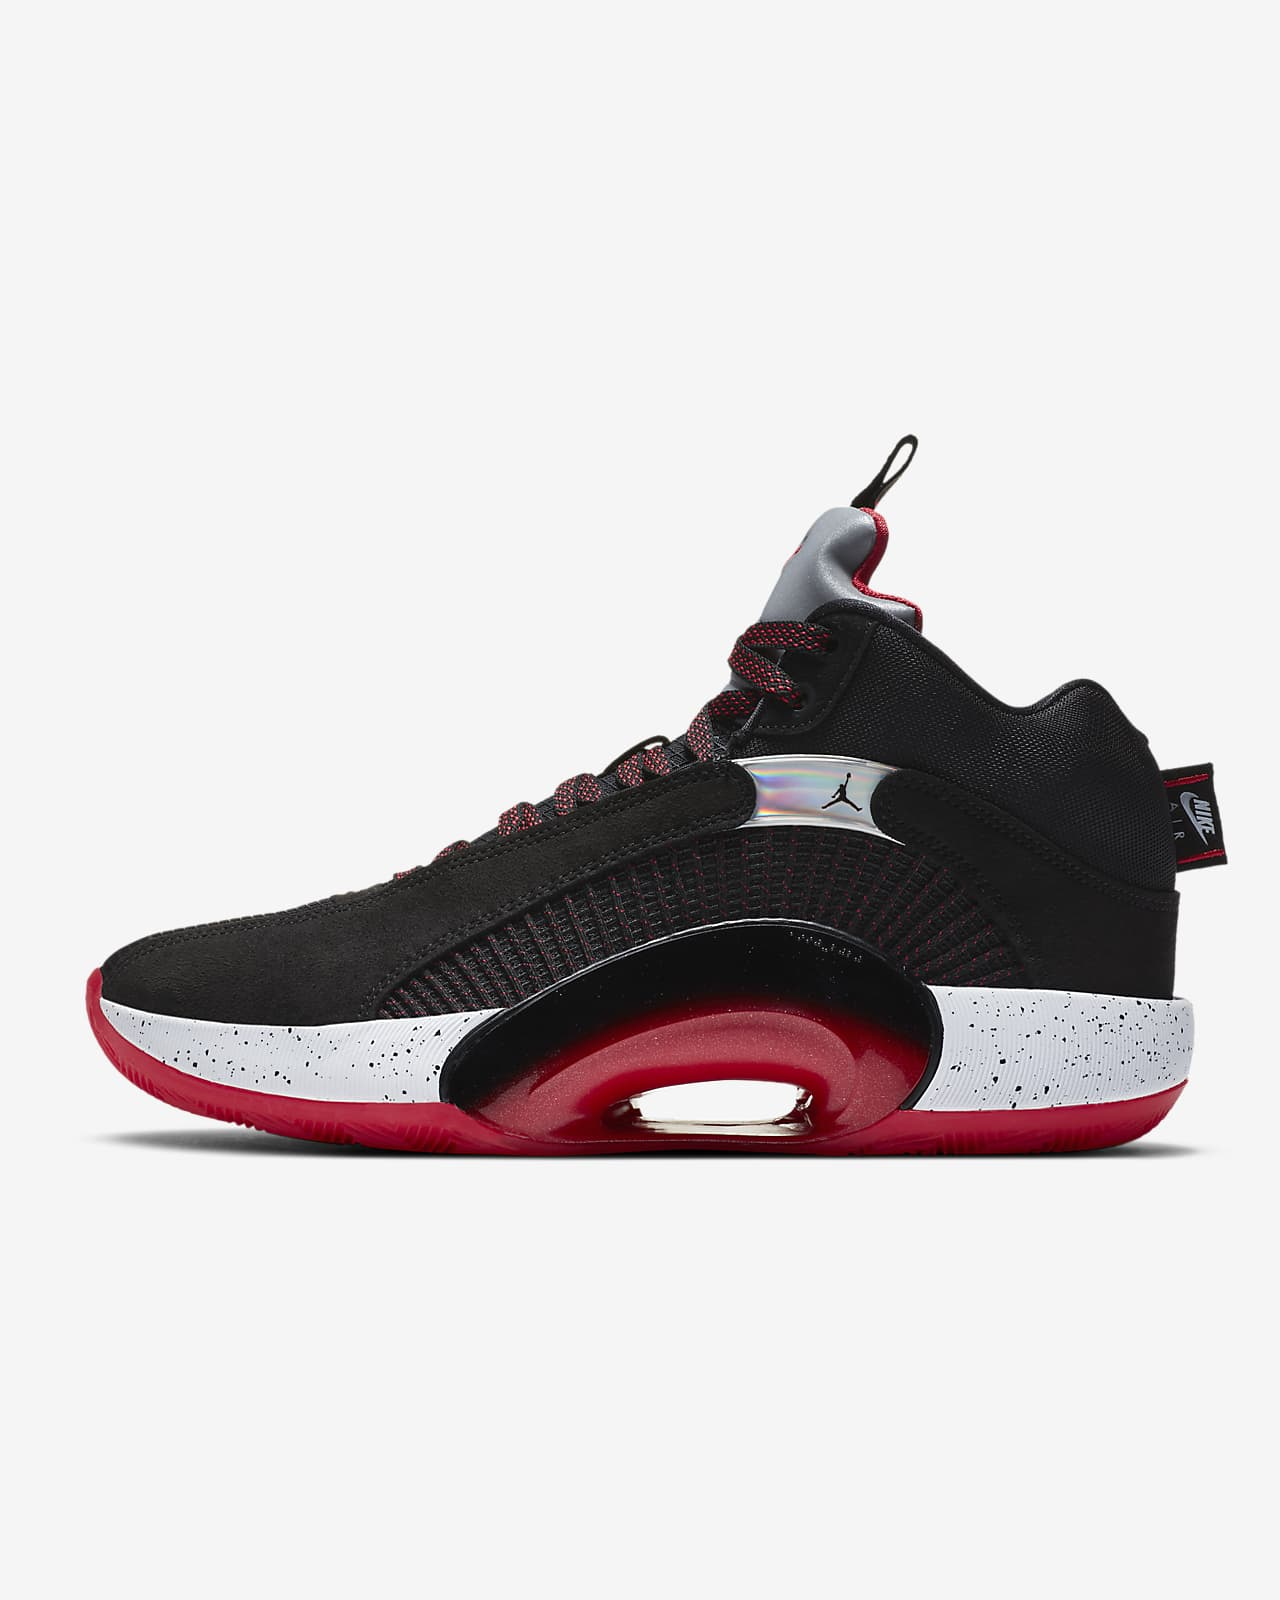 Buty do koszykówki Air Jordan XXXV